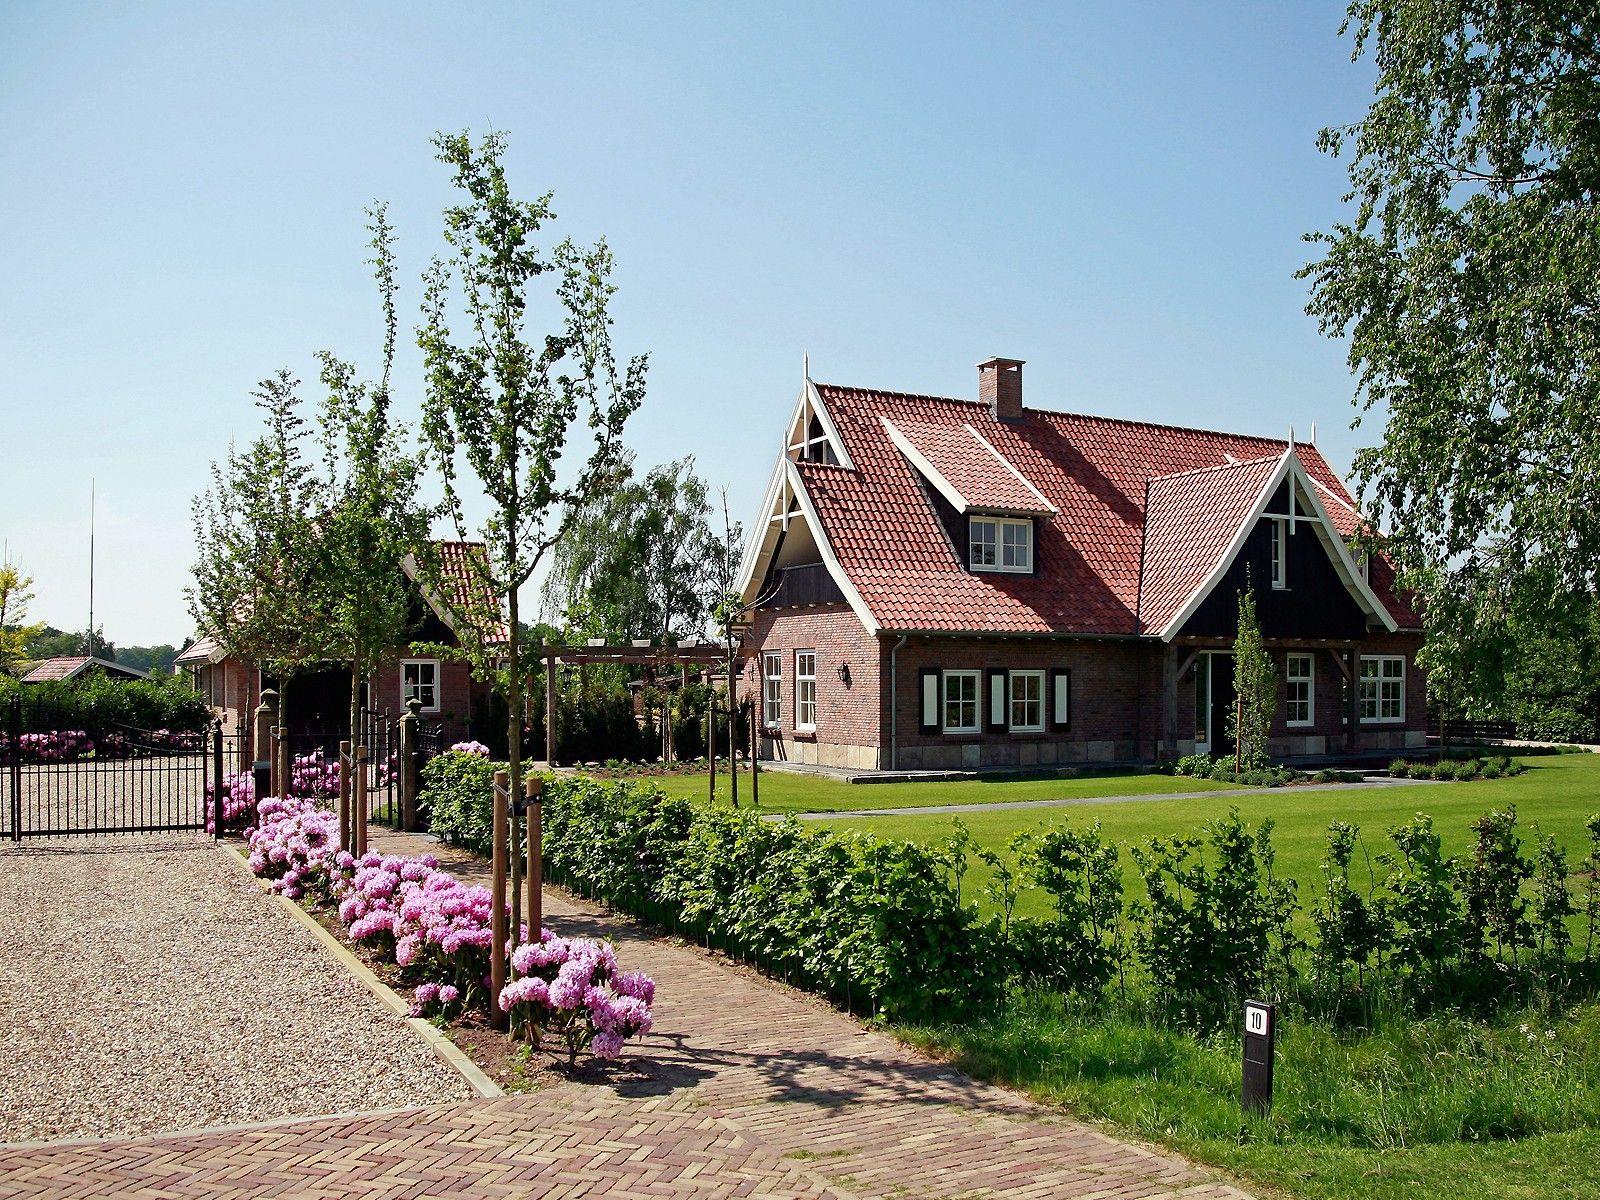 De Boerderij Huizen : De boerderij huizen in huizen lees reviews the dj company